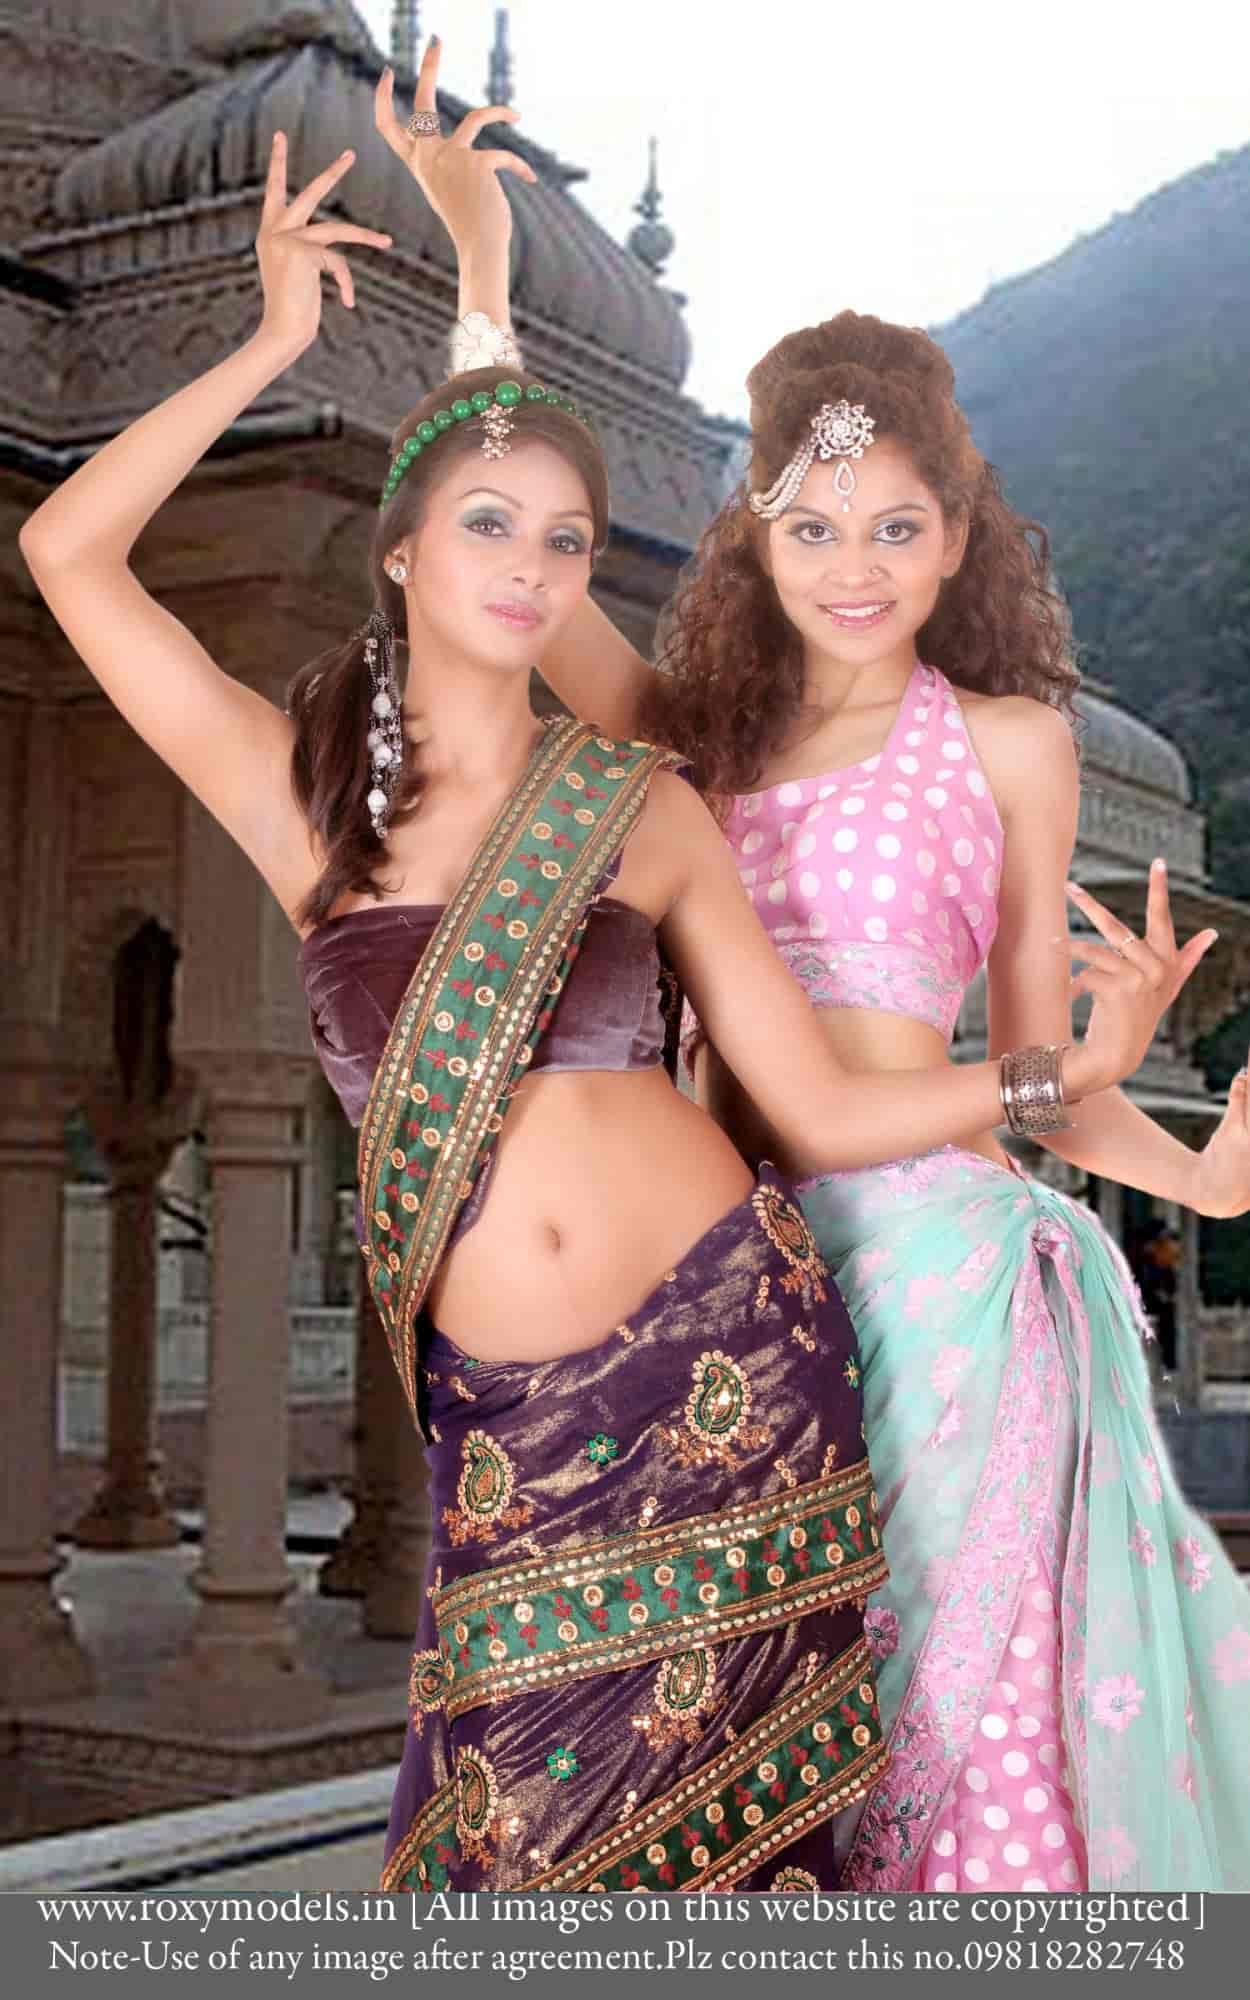 Vv Models Photos, West Patel Nagar, Delhi- Pictures & Images